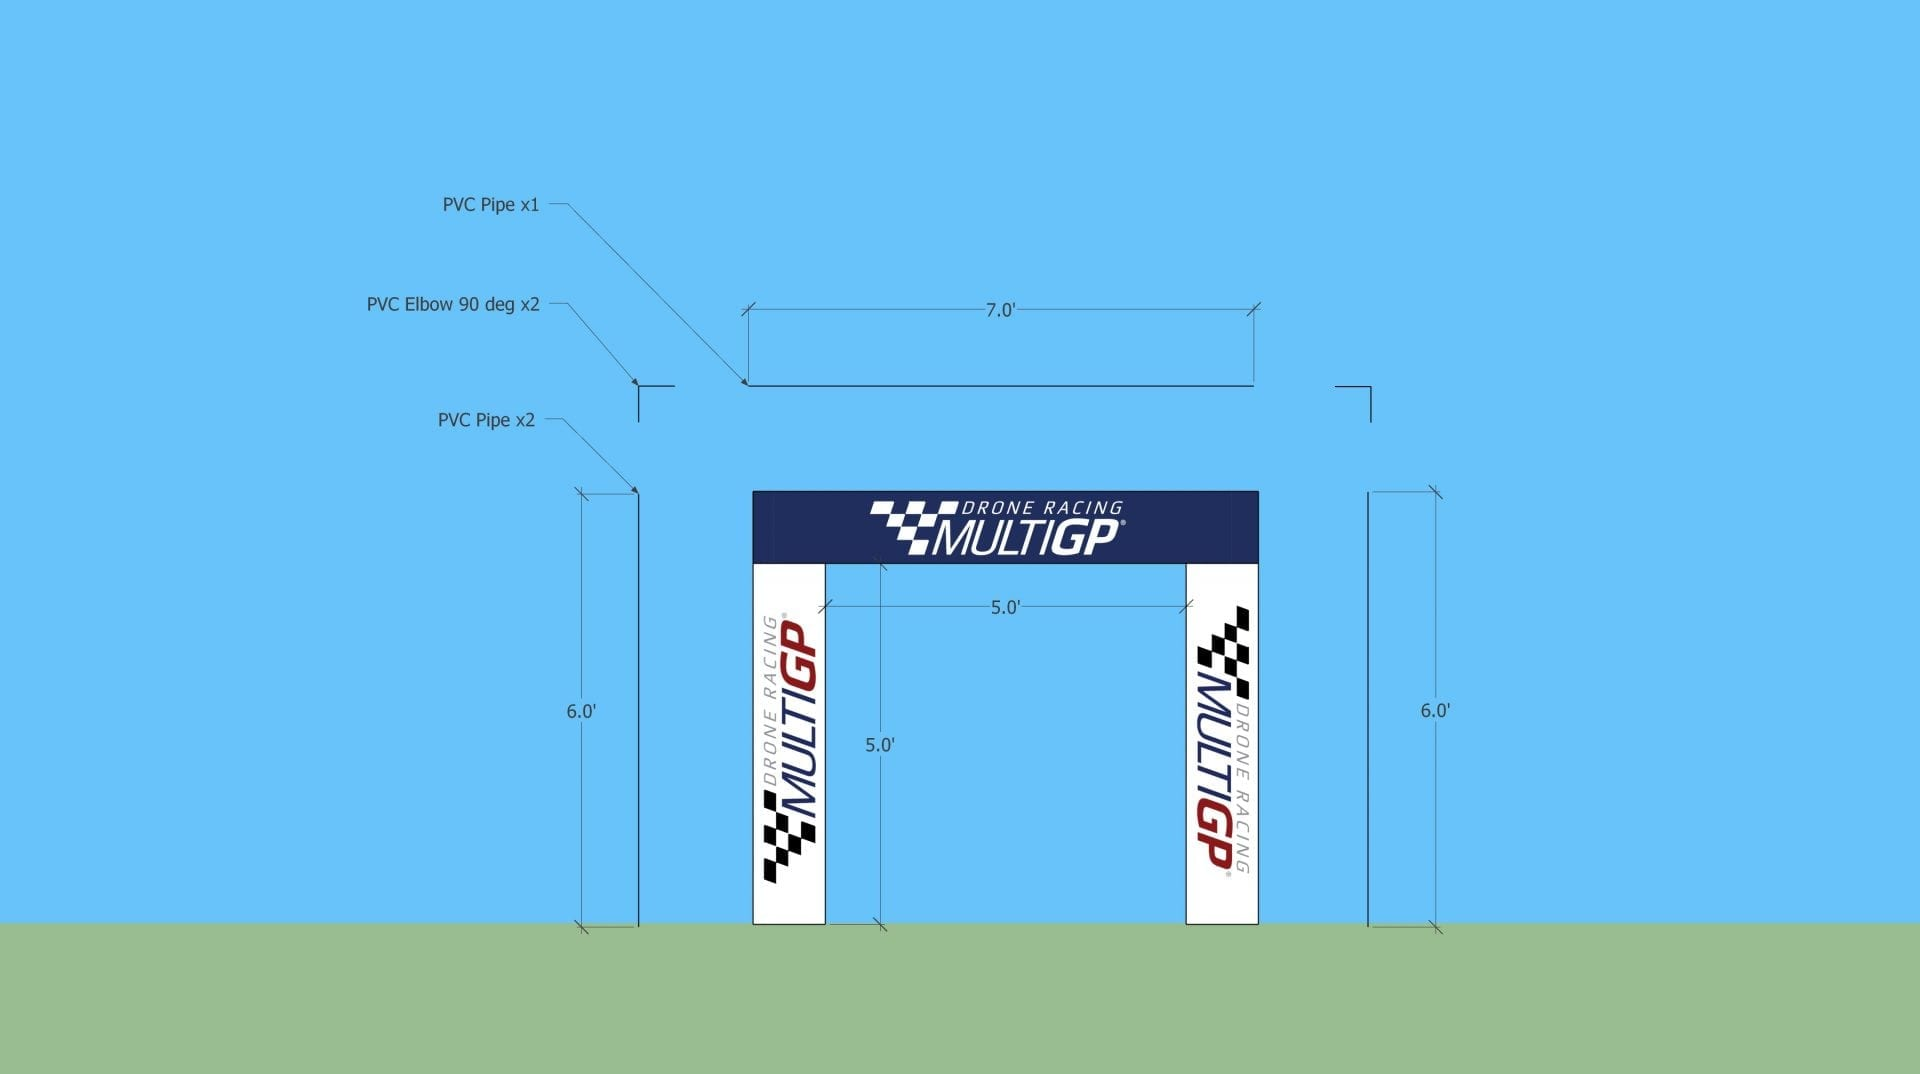 MultiGP Drone Race Course Obstacles - MultiGP Drone Racing